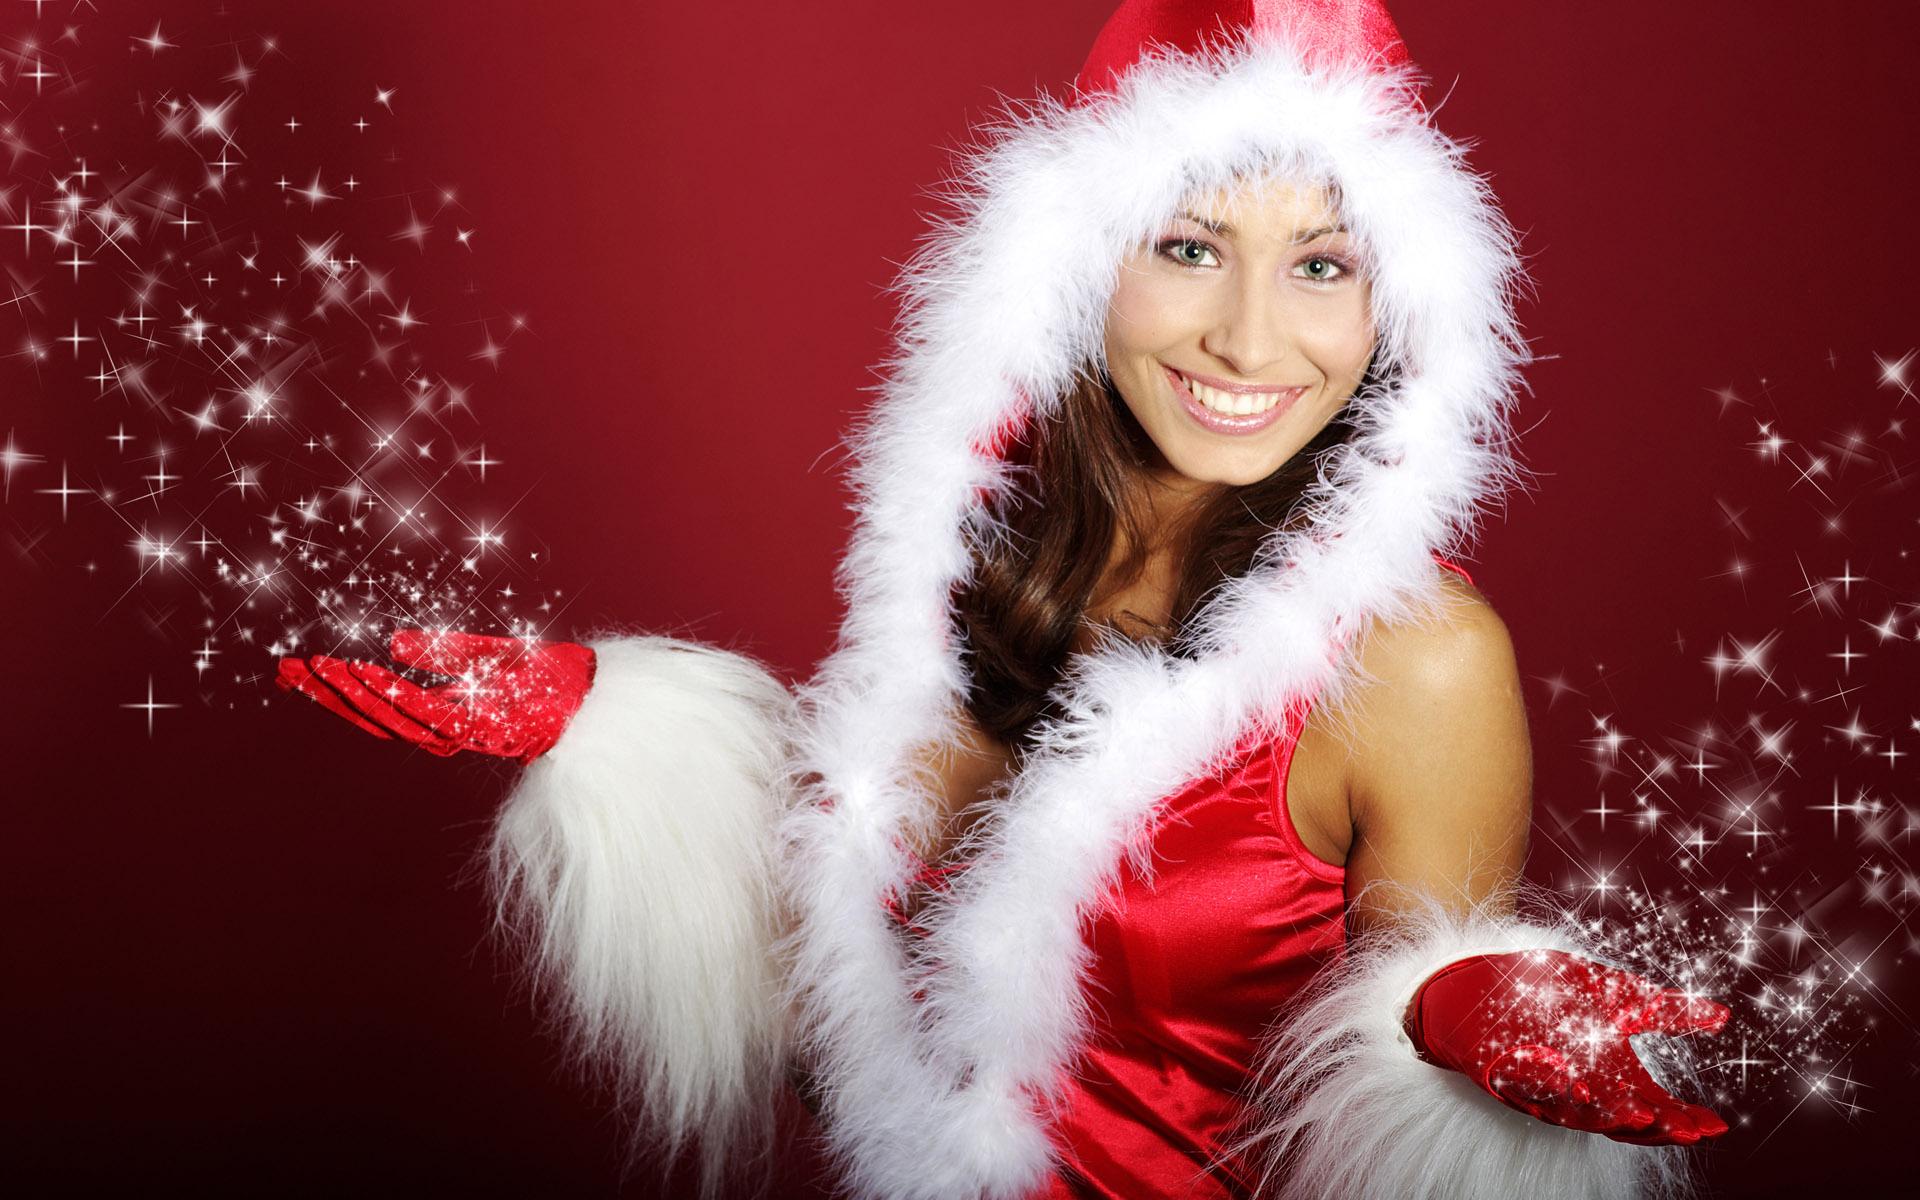 High-definition Christmas girl 26746 - Christmas - Festival